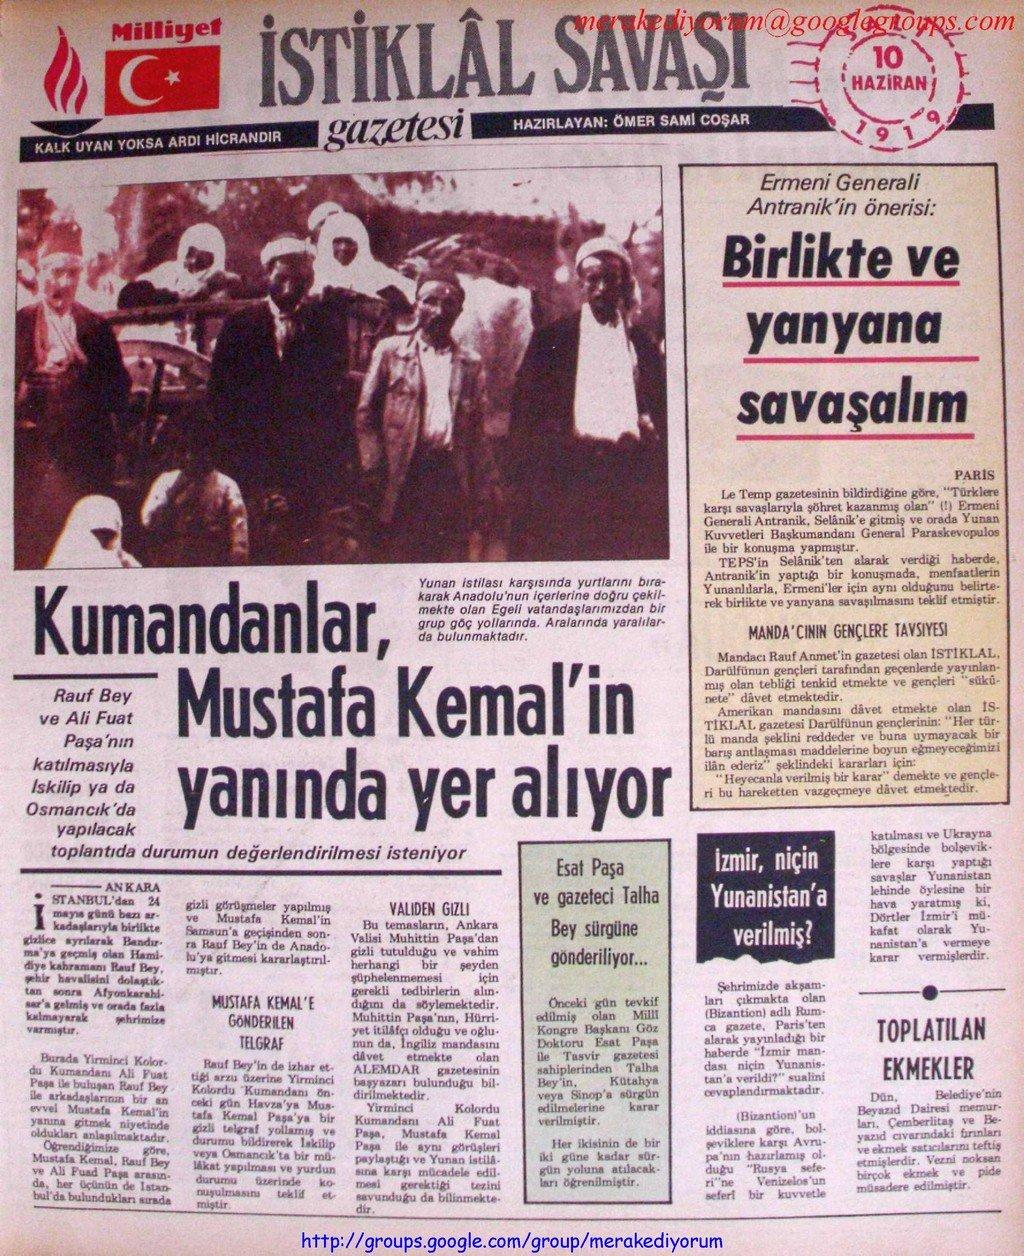 istiklal savaşı gazetesi - 10 haziran 1919